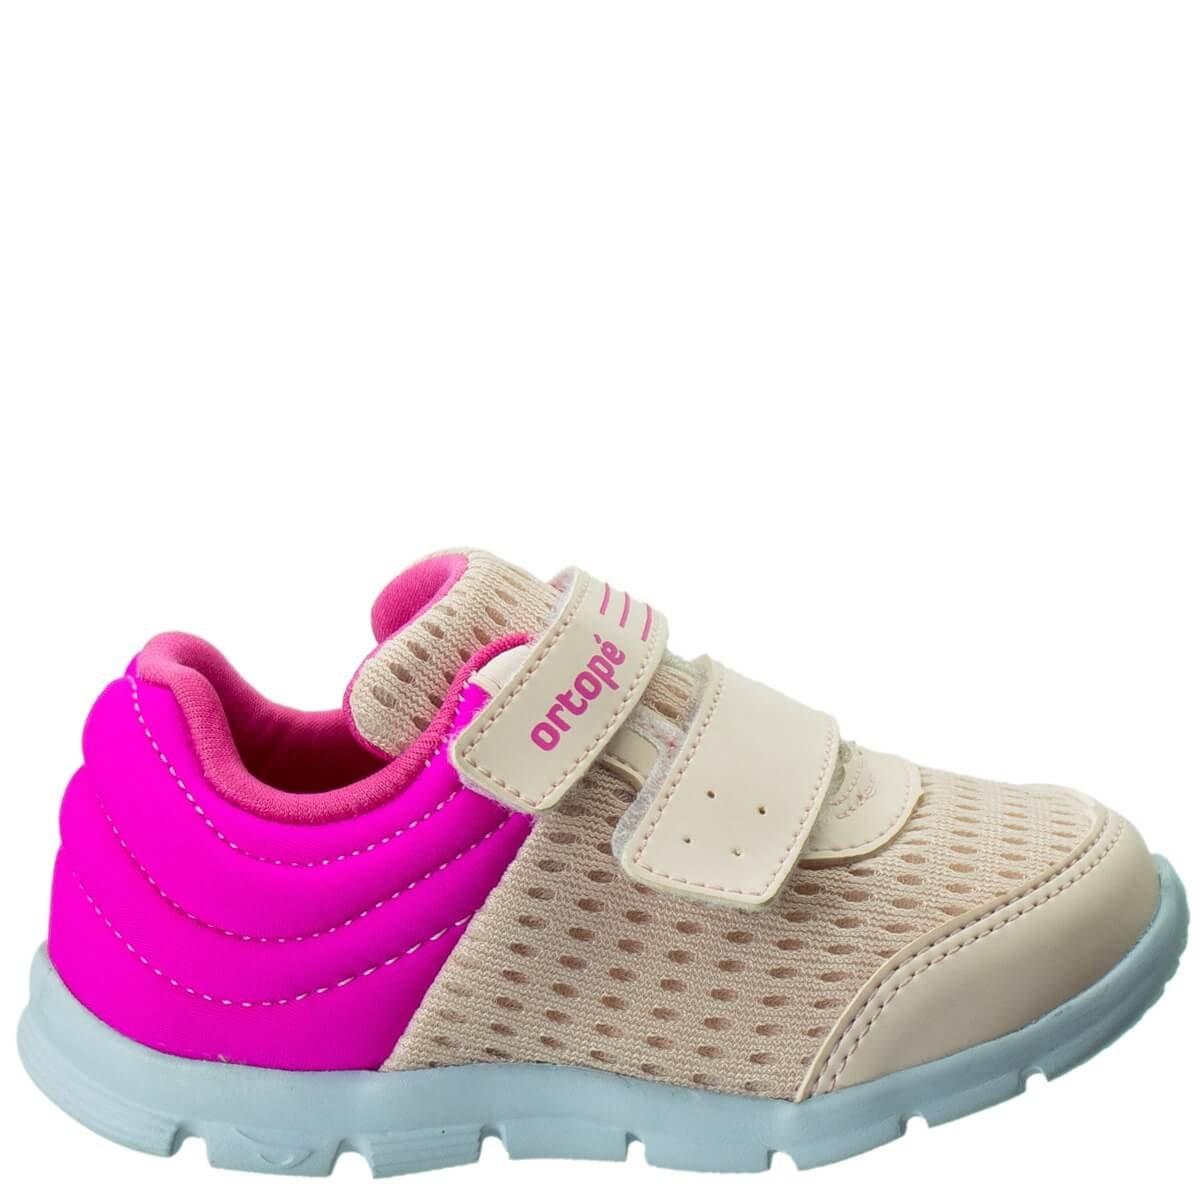 5419cf88a9 Bizz Store - Tênis Infantil Menina Ortopé EVA Baby